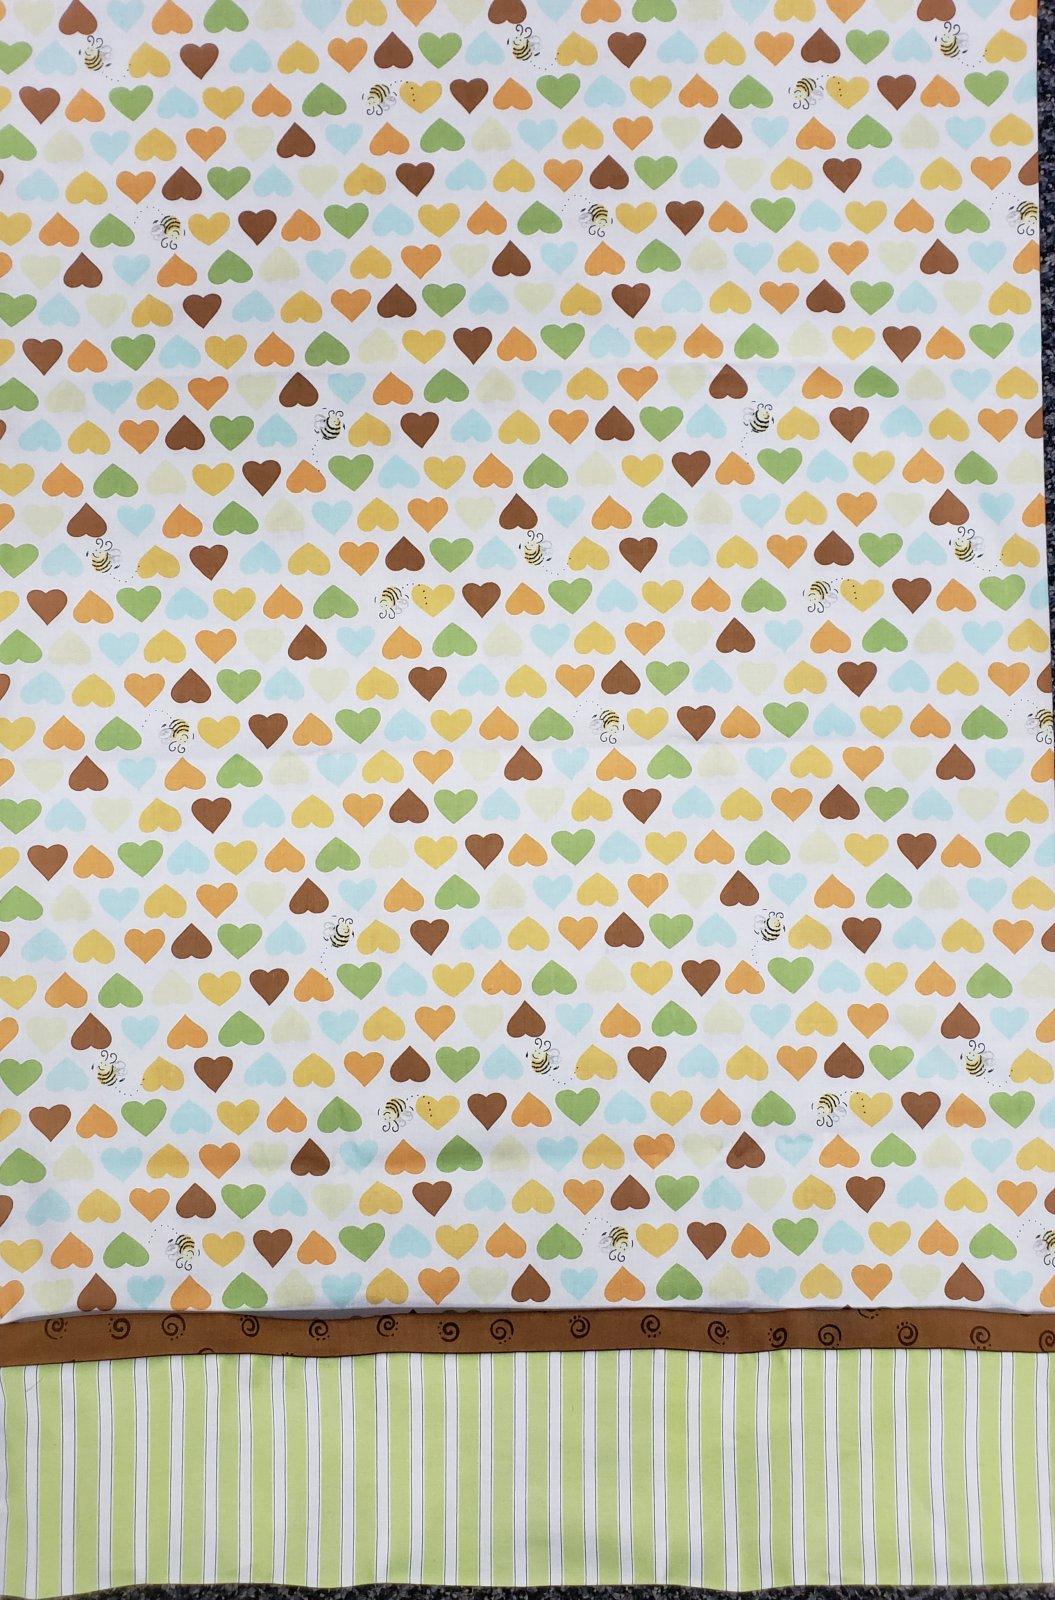 Hearts and Bees Pillowcase